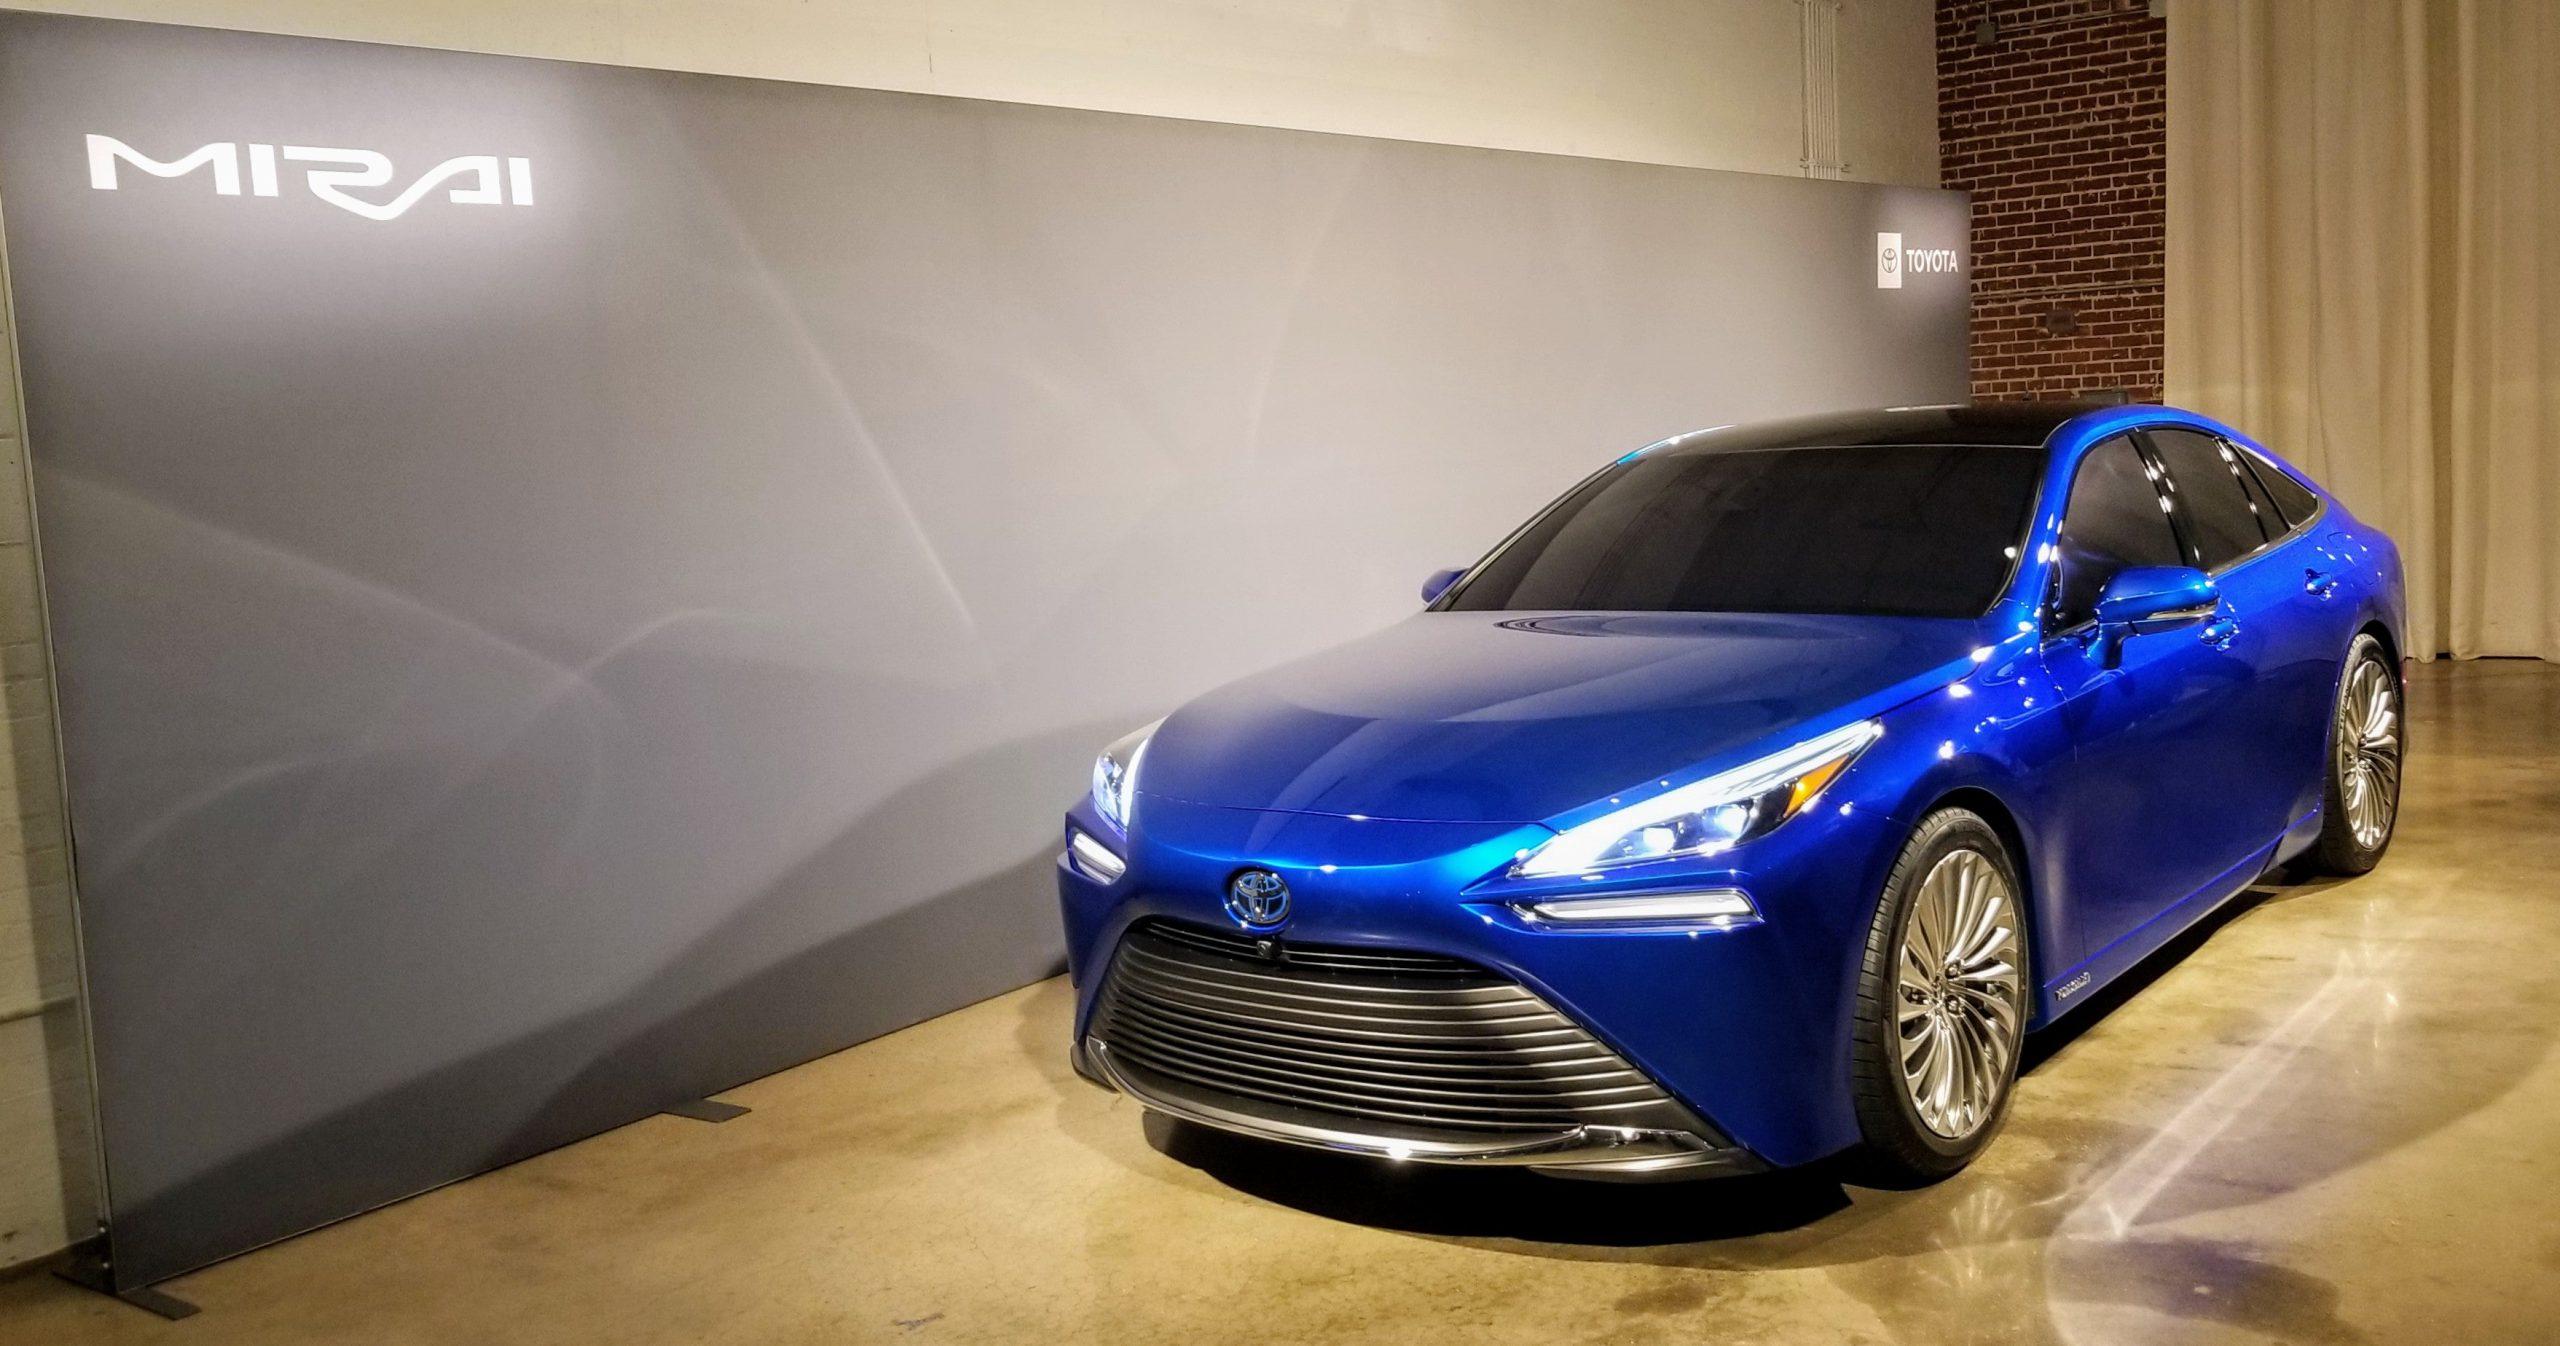 HD Toyota Mirai